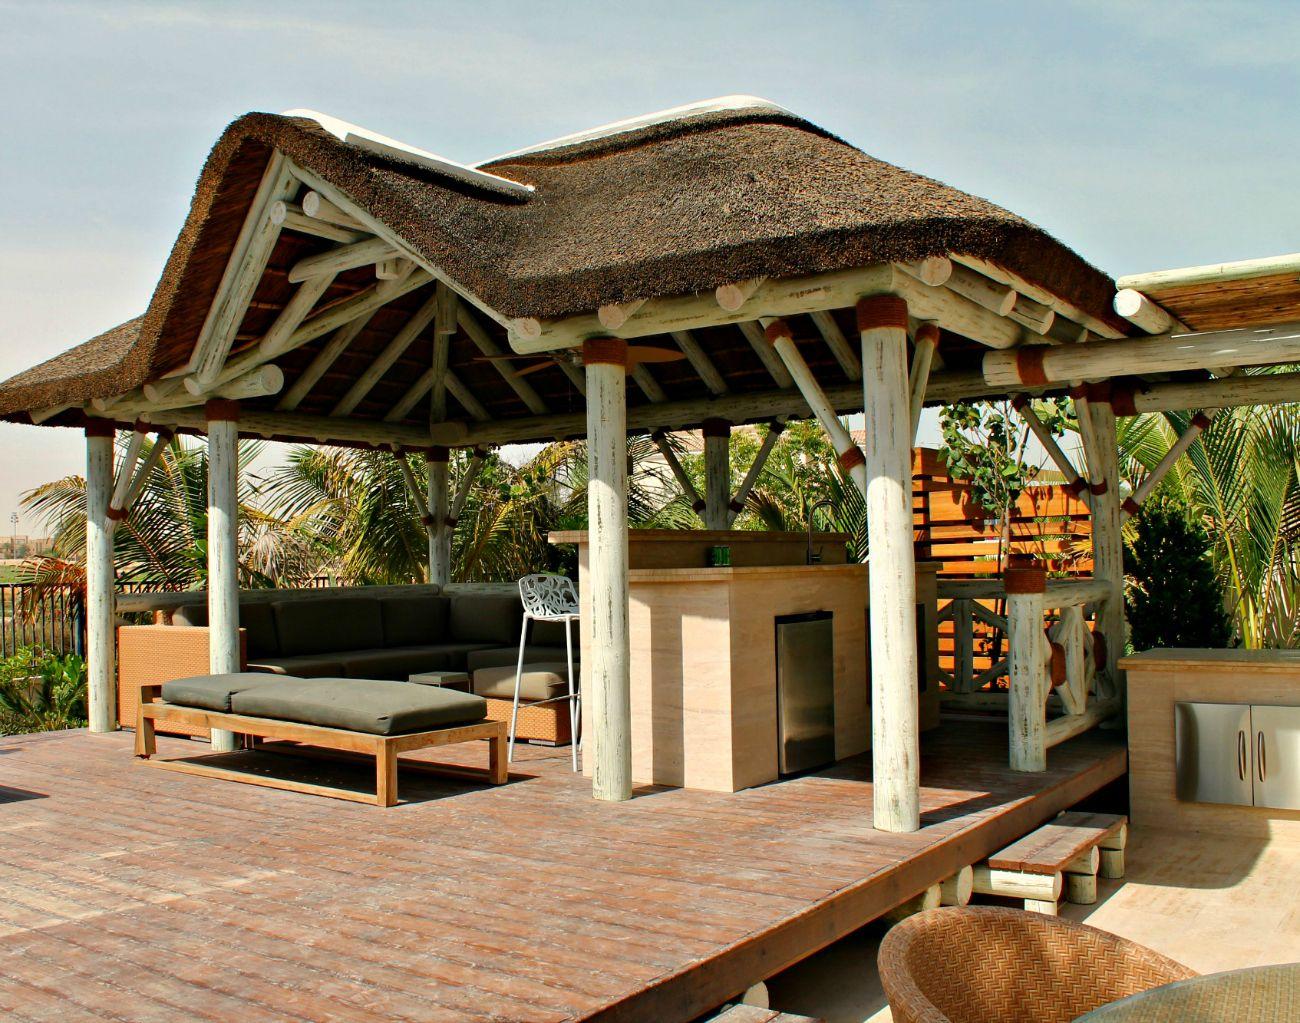 Modern Whitewash Thatched Gazebo With Outdoor Seating, Pergola U0026 Kitchen!